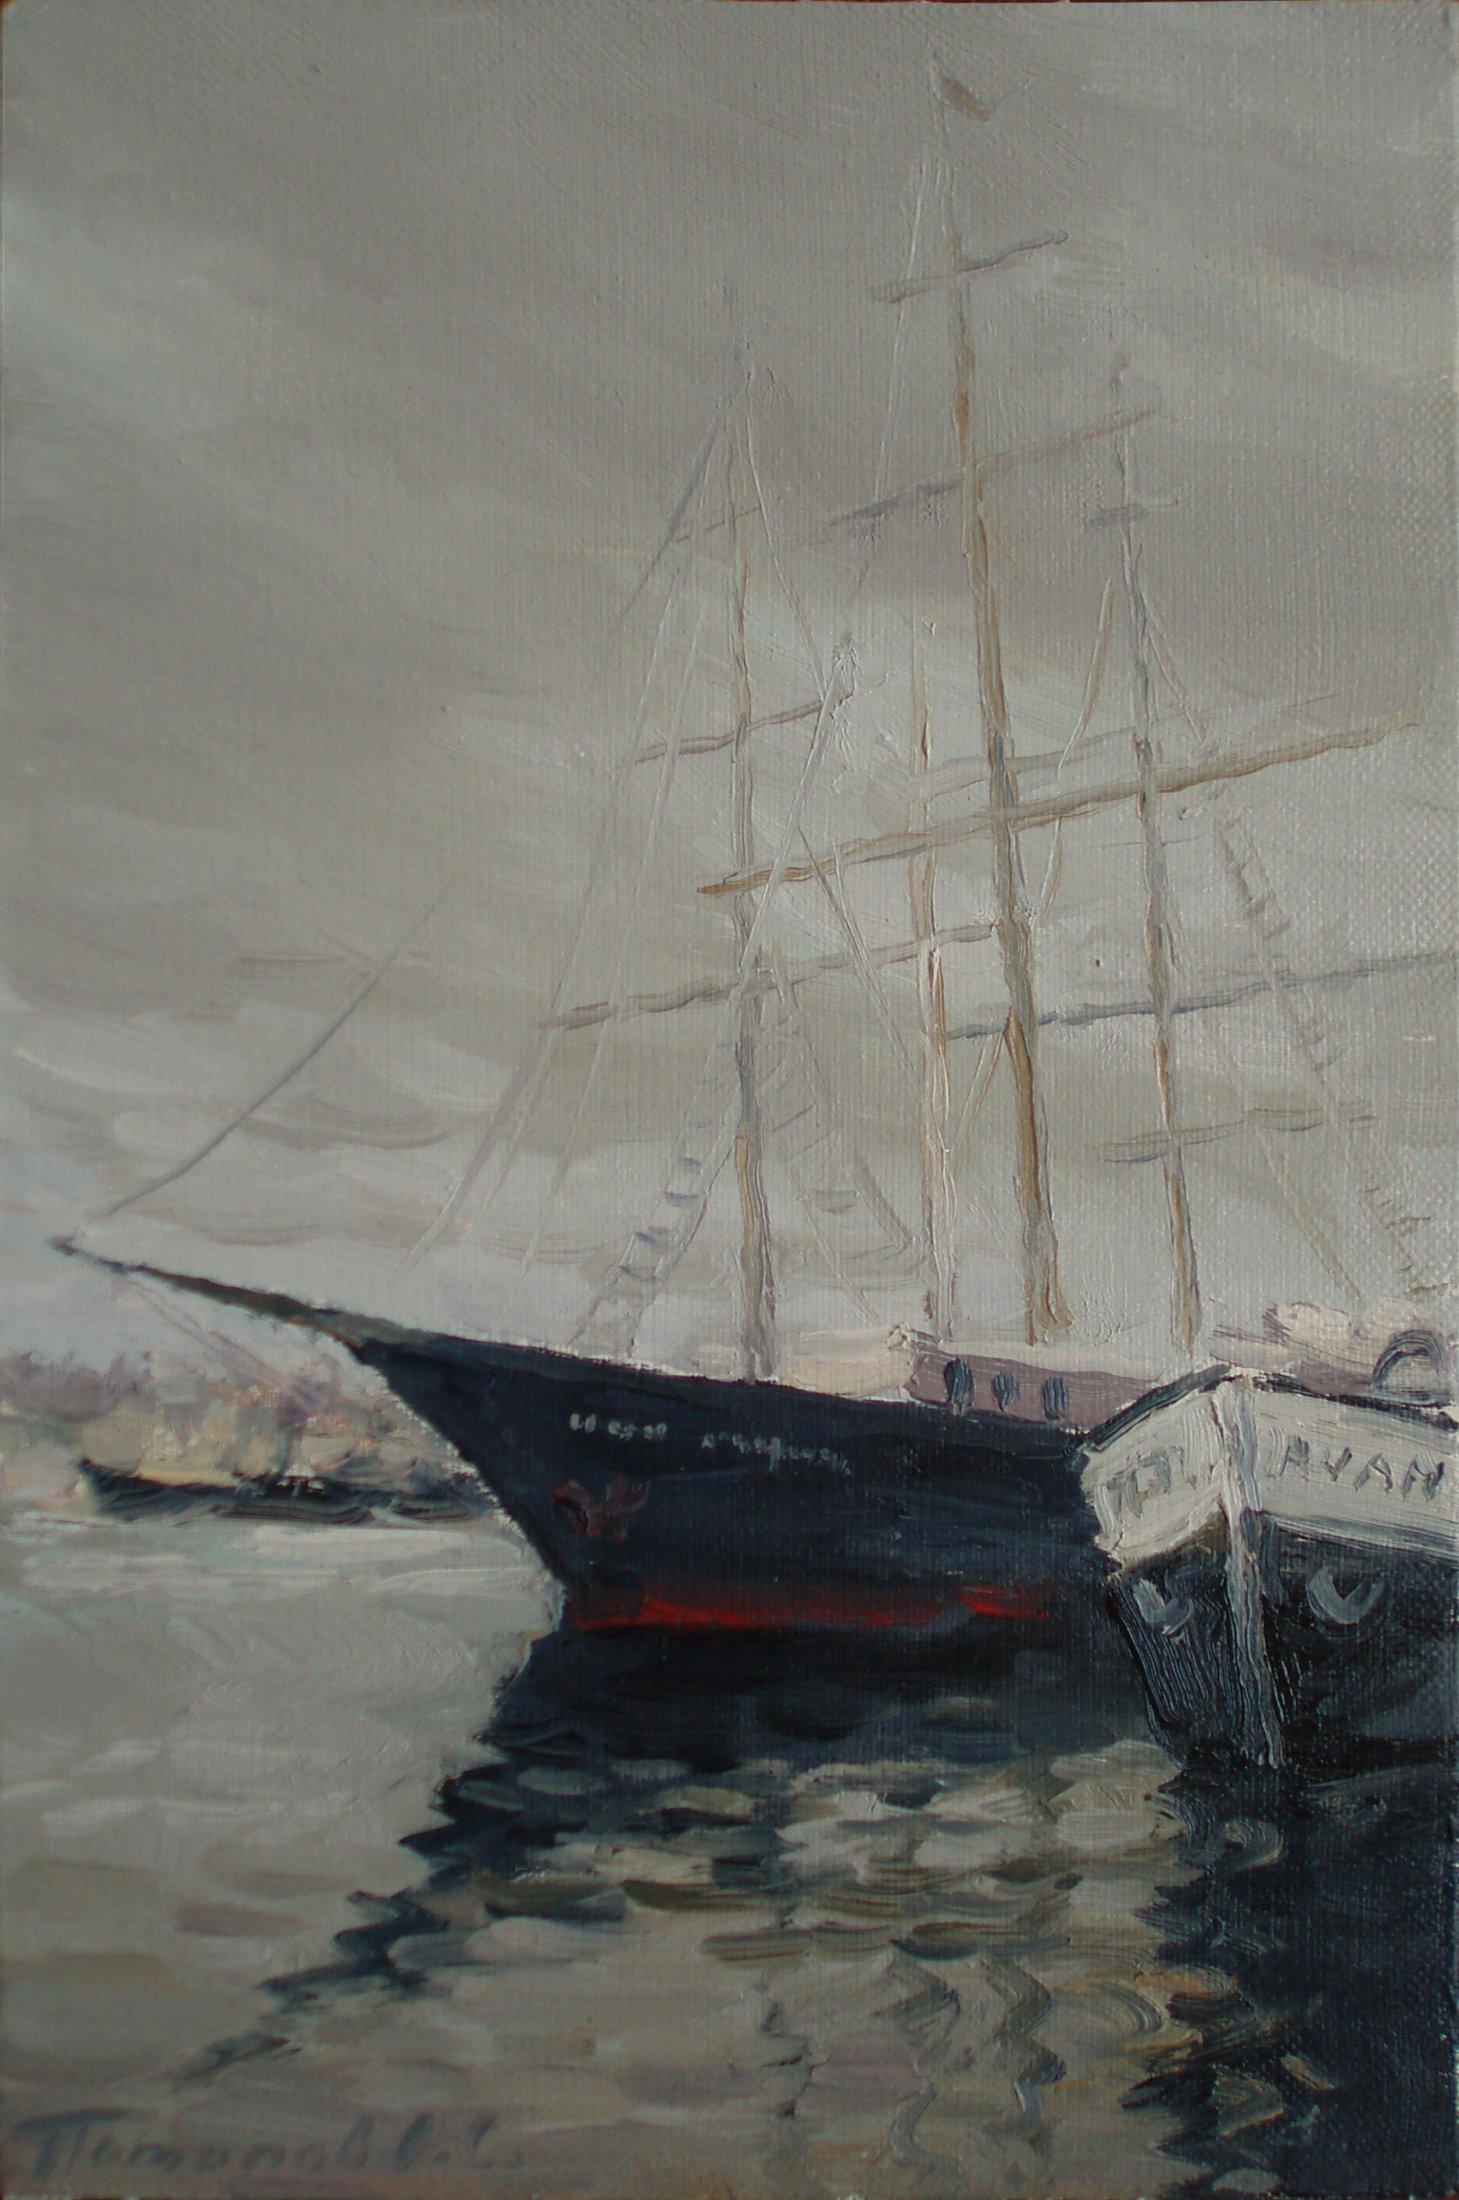 6. Голландия. Корабли. 2009. Х., м. 30х20